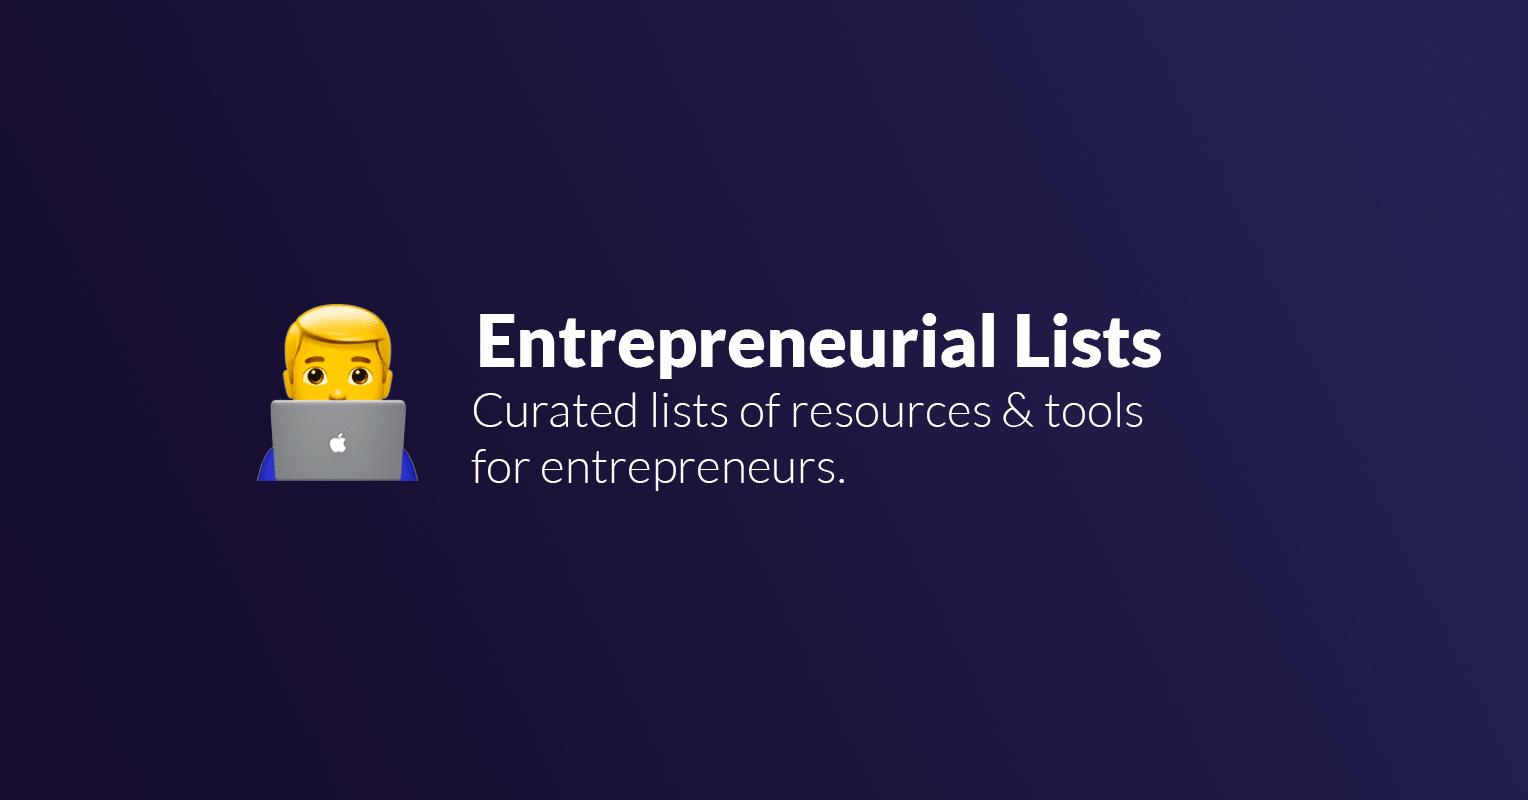 failory entrepreneurial listsBest Landing Page Builder Unbounce Vs Instapage PsPrint Blog 347598 #11